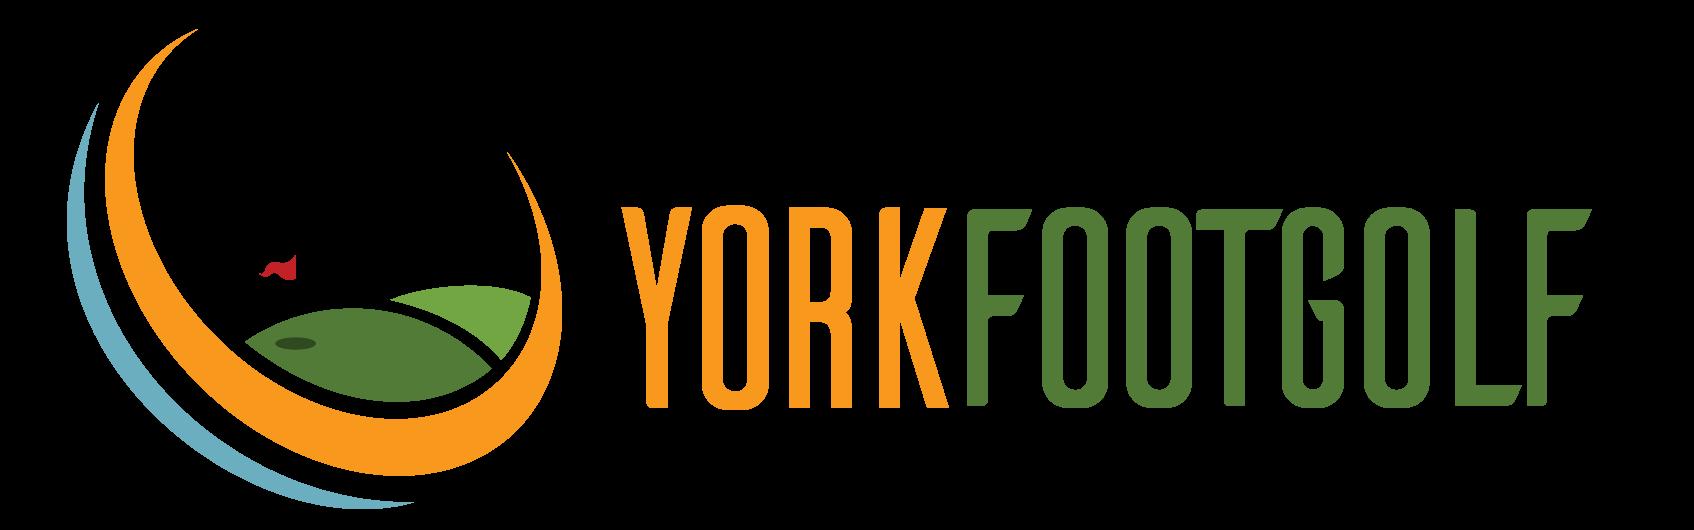 York FootGolf